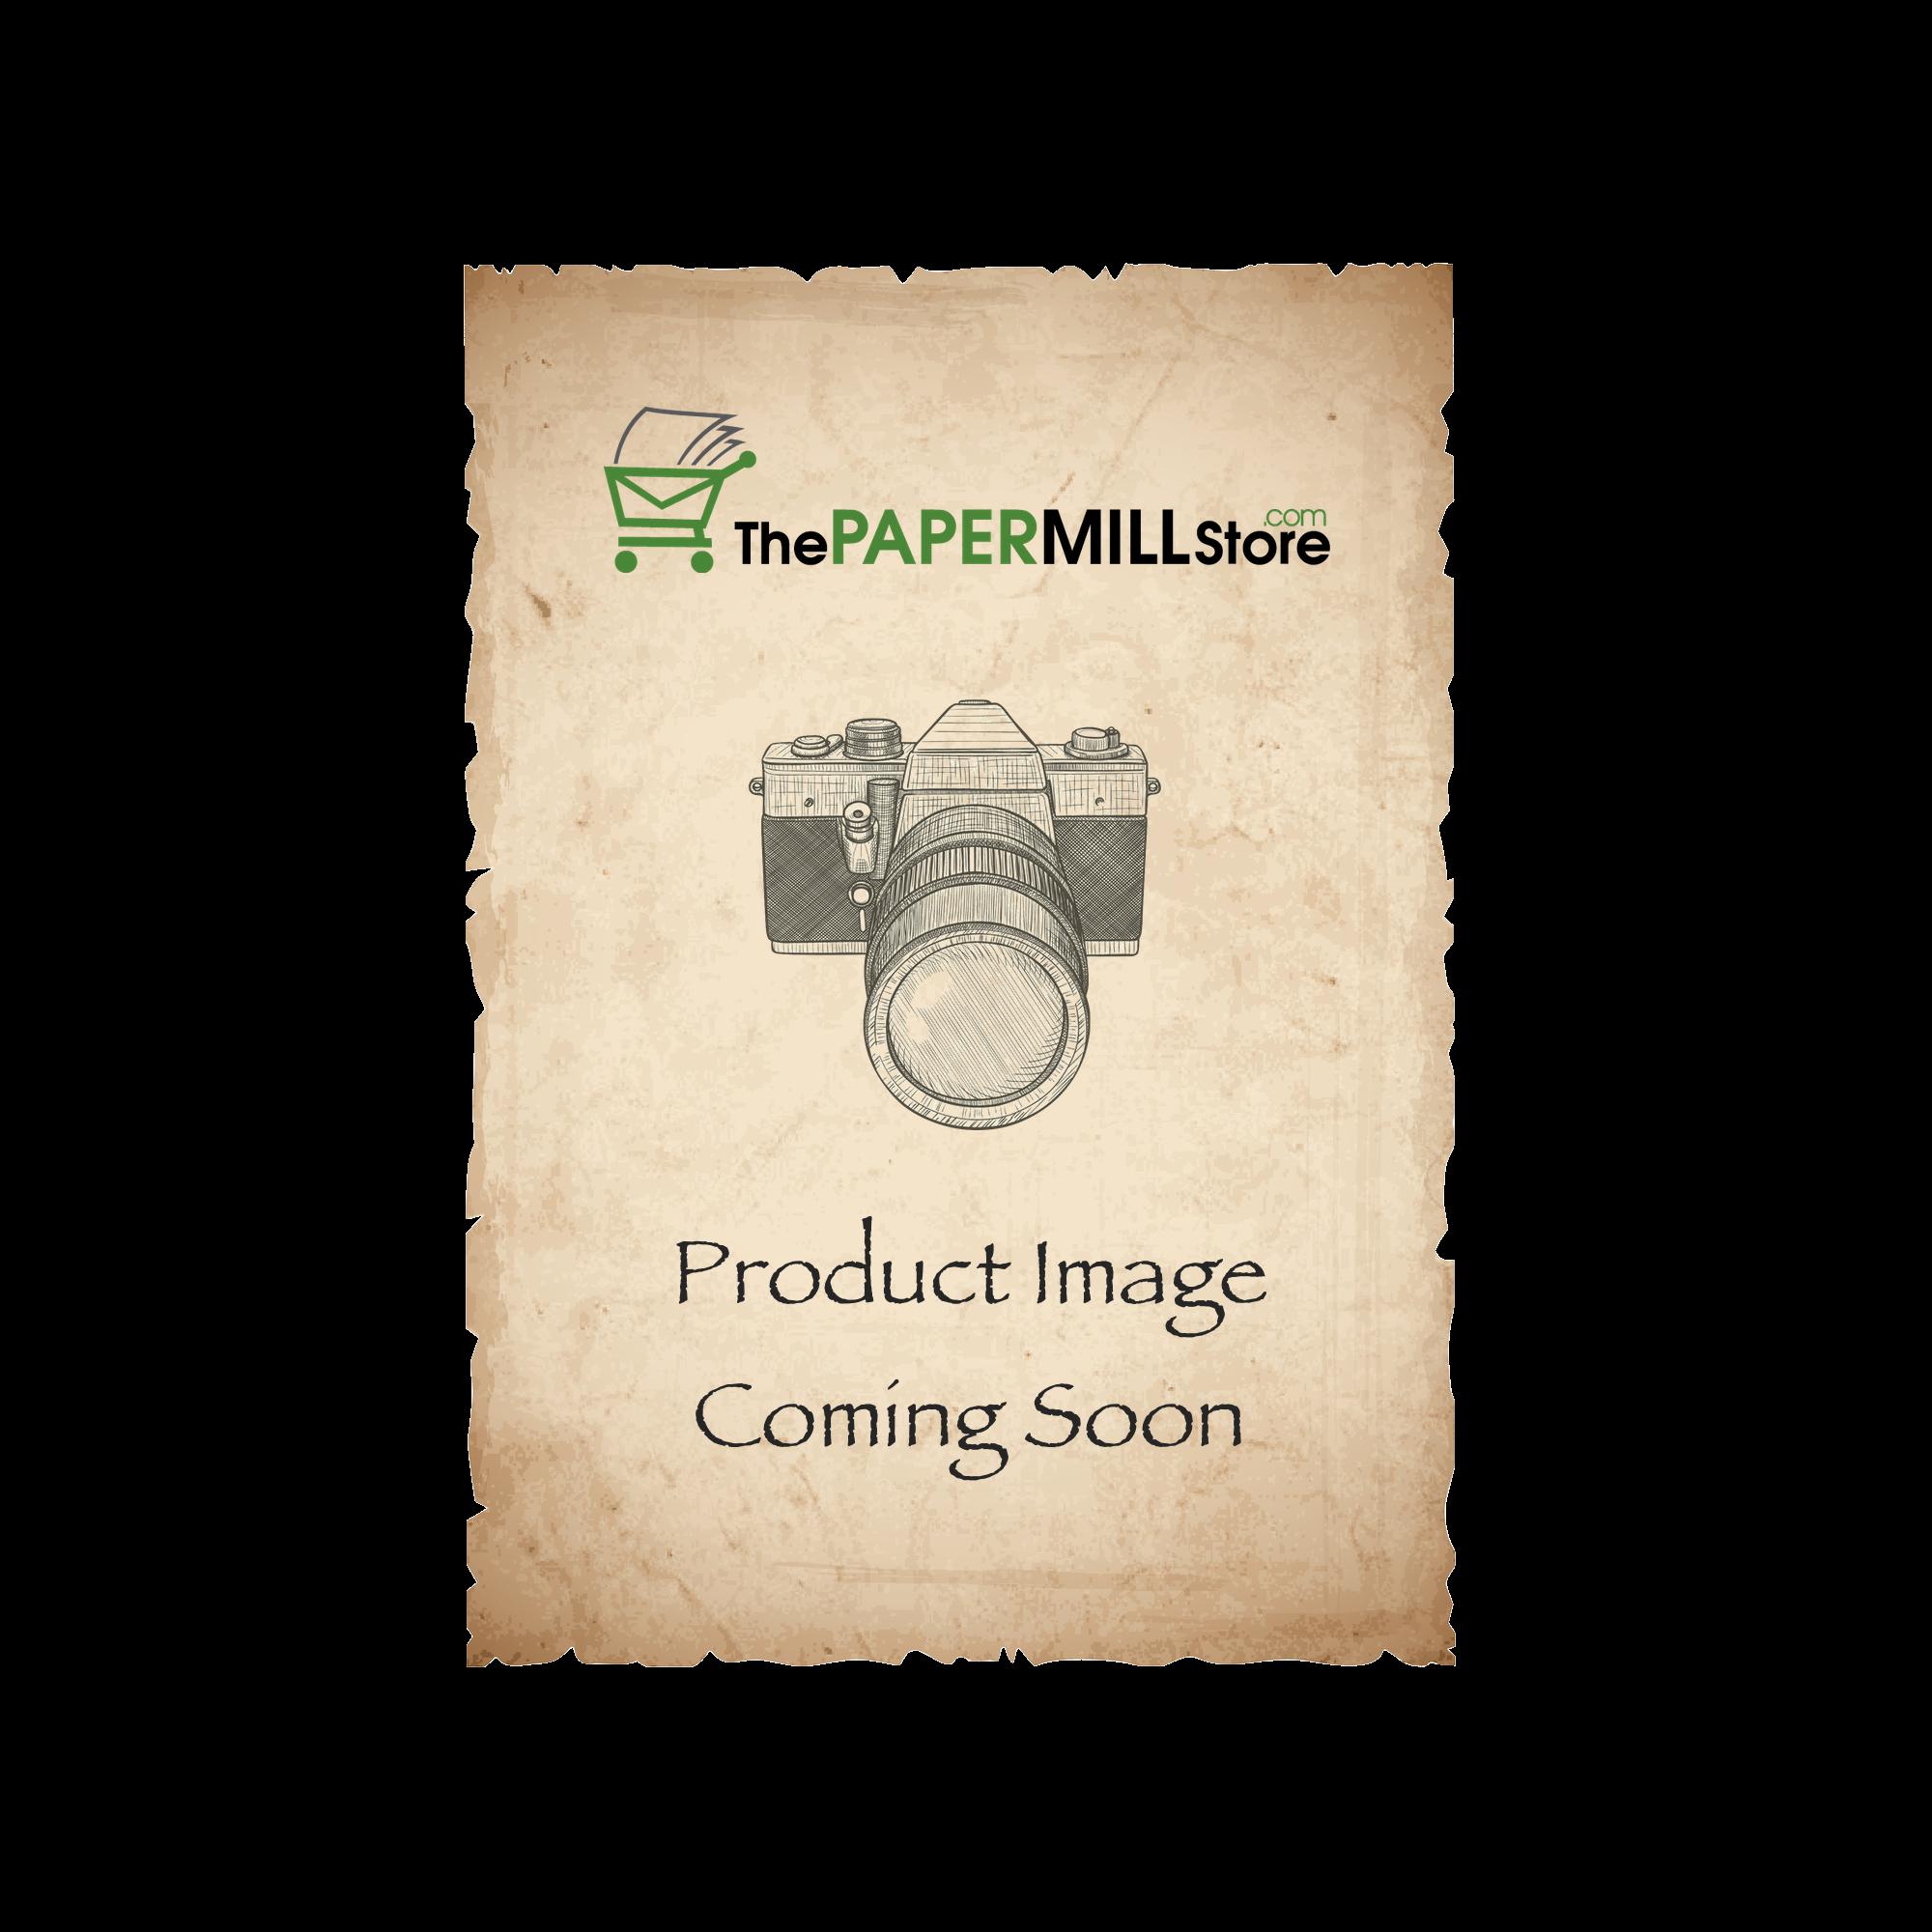 Tube Mud Envelopes - No. 10 Commercial (4 1/8 x 9 1/2) 88 lb Text Soft Flat Matte C/2S 2500 per Carton